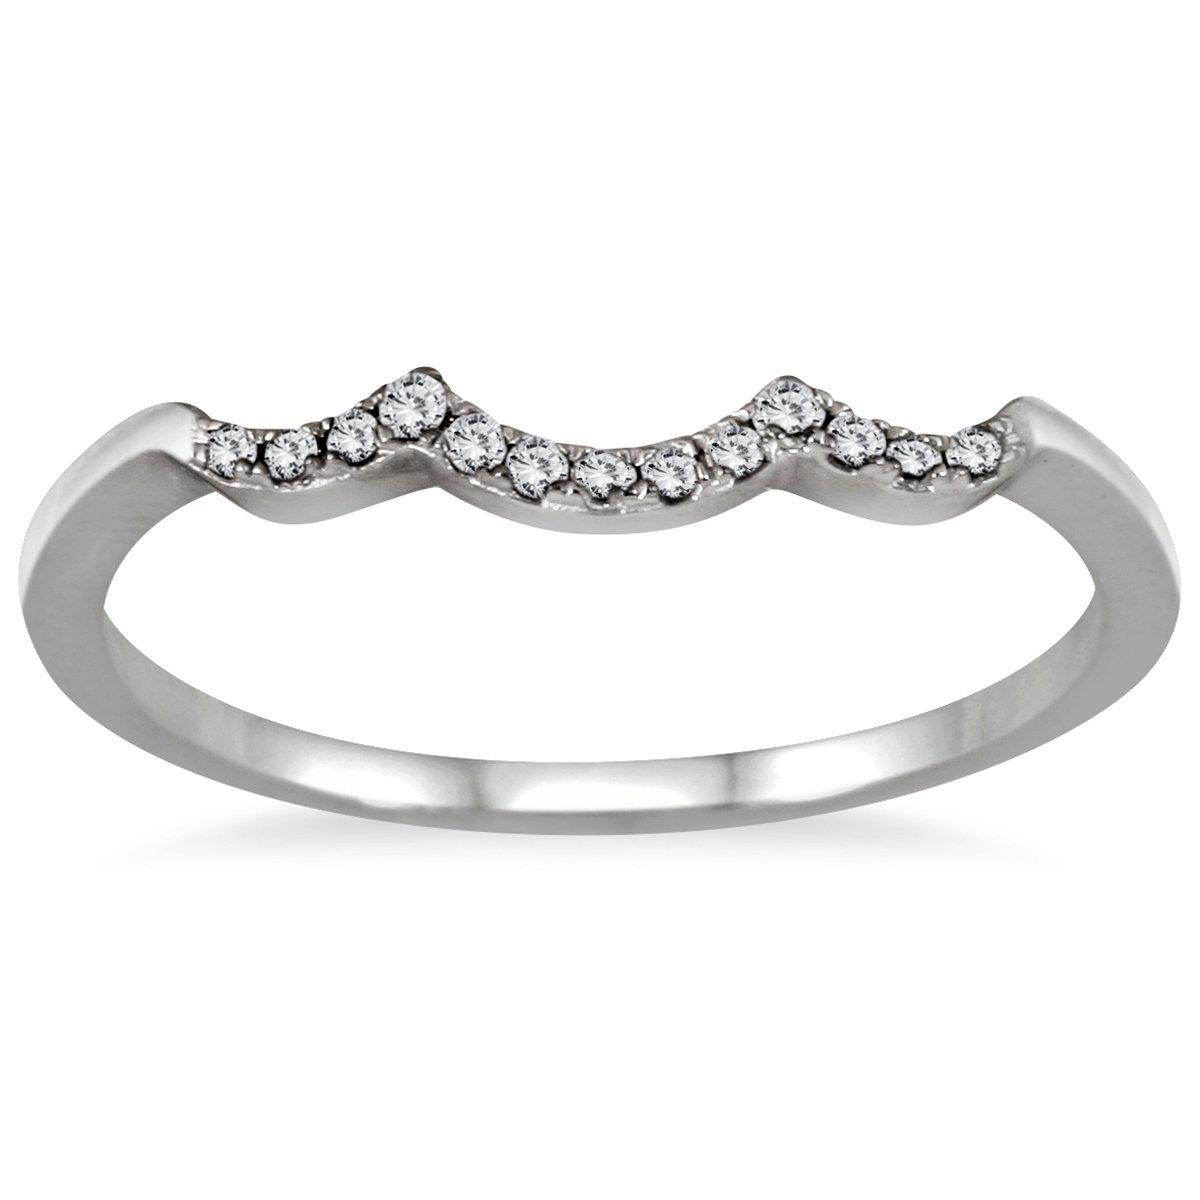 1//2 Carat TW Three Stone Diamond Cluster Bridal Set in 10K White Gold